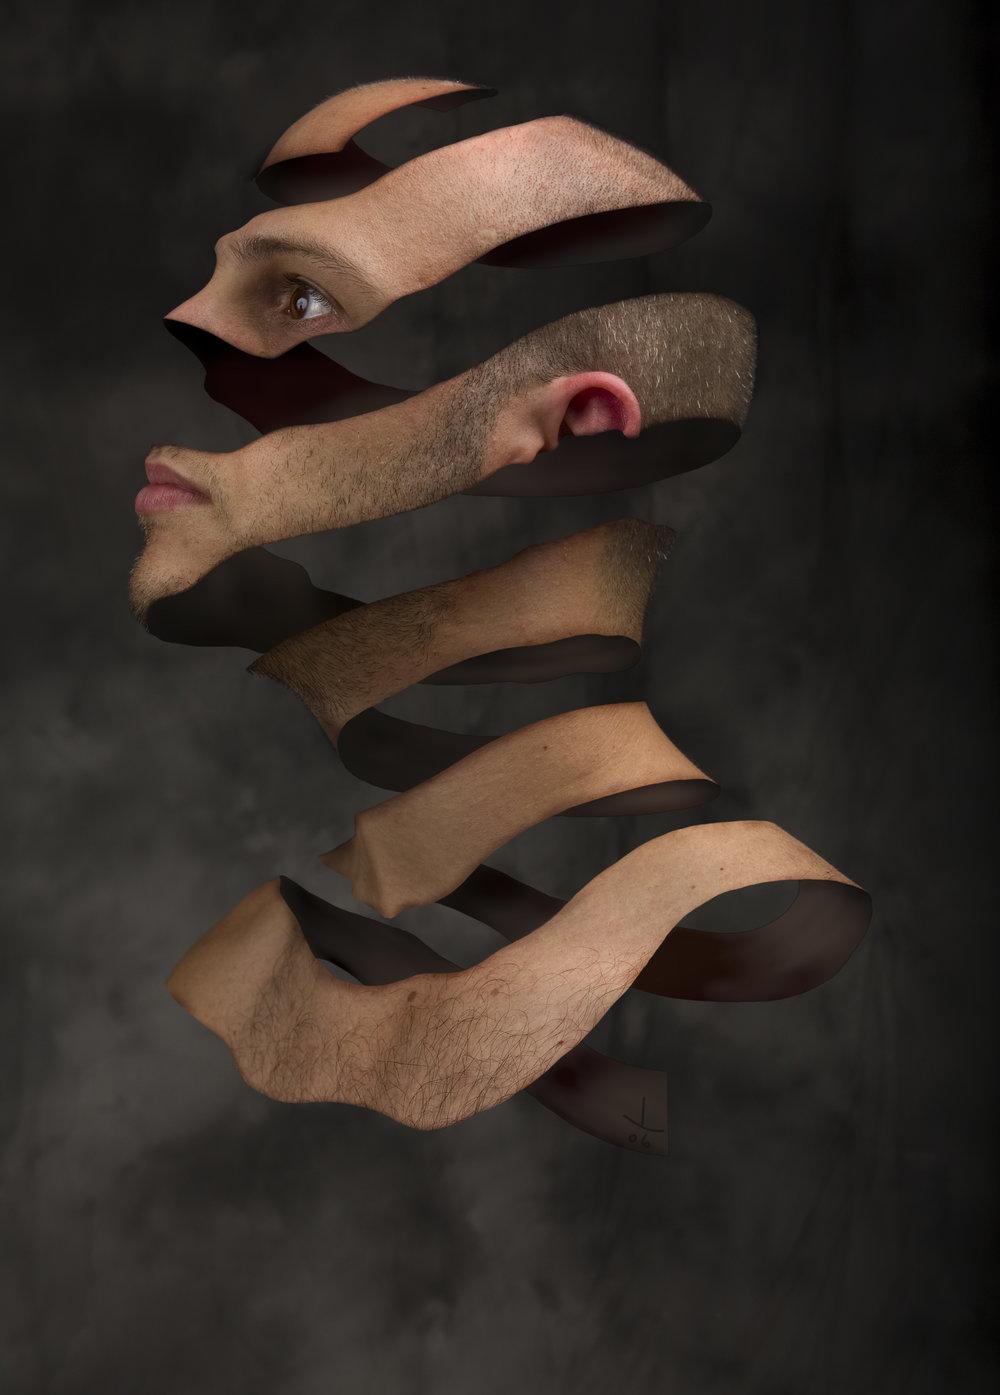 Jeff-Lieberman-unraveled.jpg